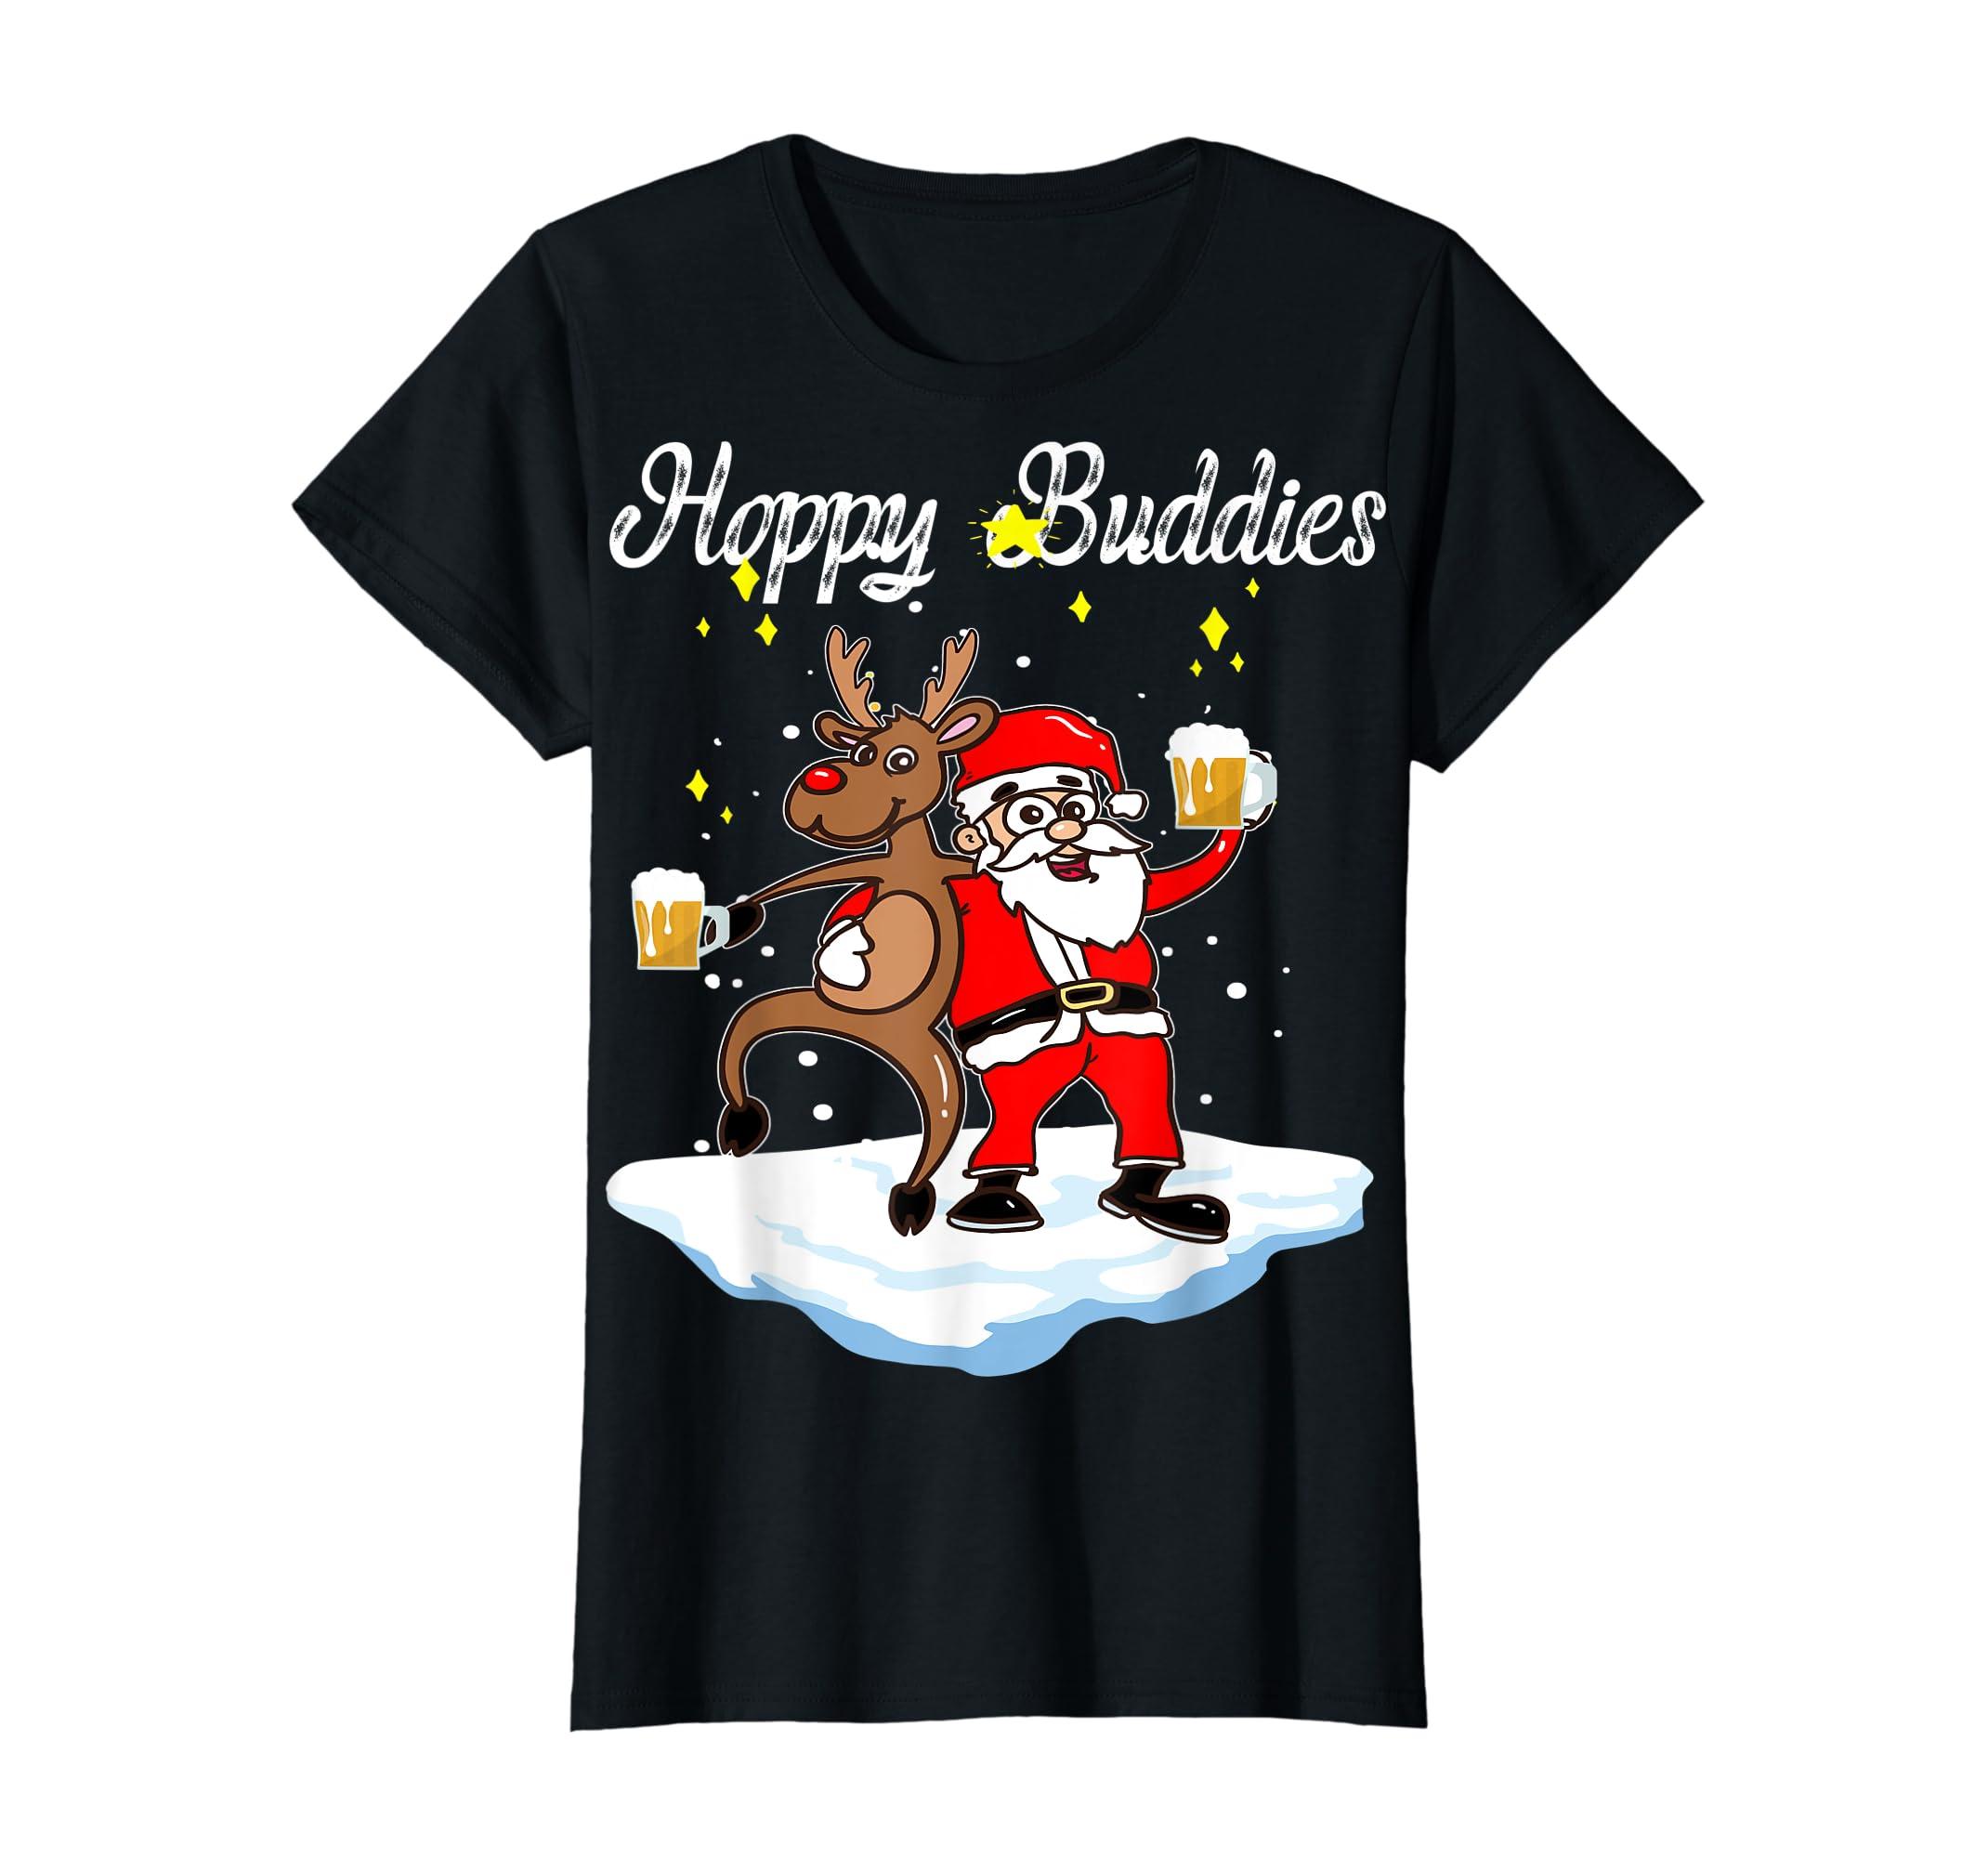 Santa Dancing Reindeer Beer Drinking T-Shirt Christmas Party T-Shirt-Women's T-Shirt-Black